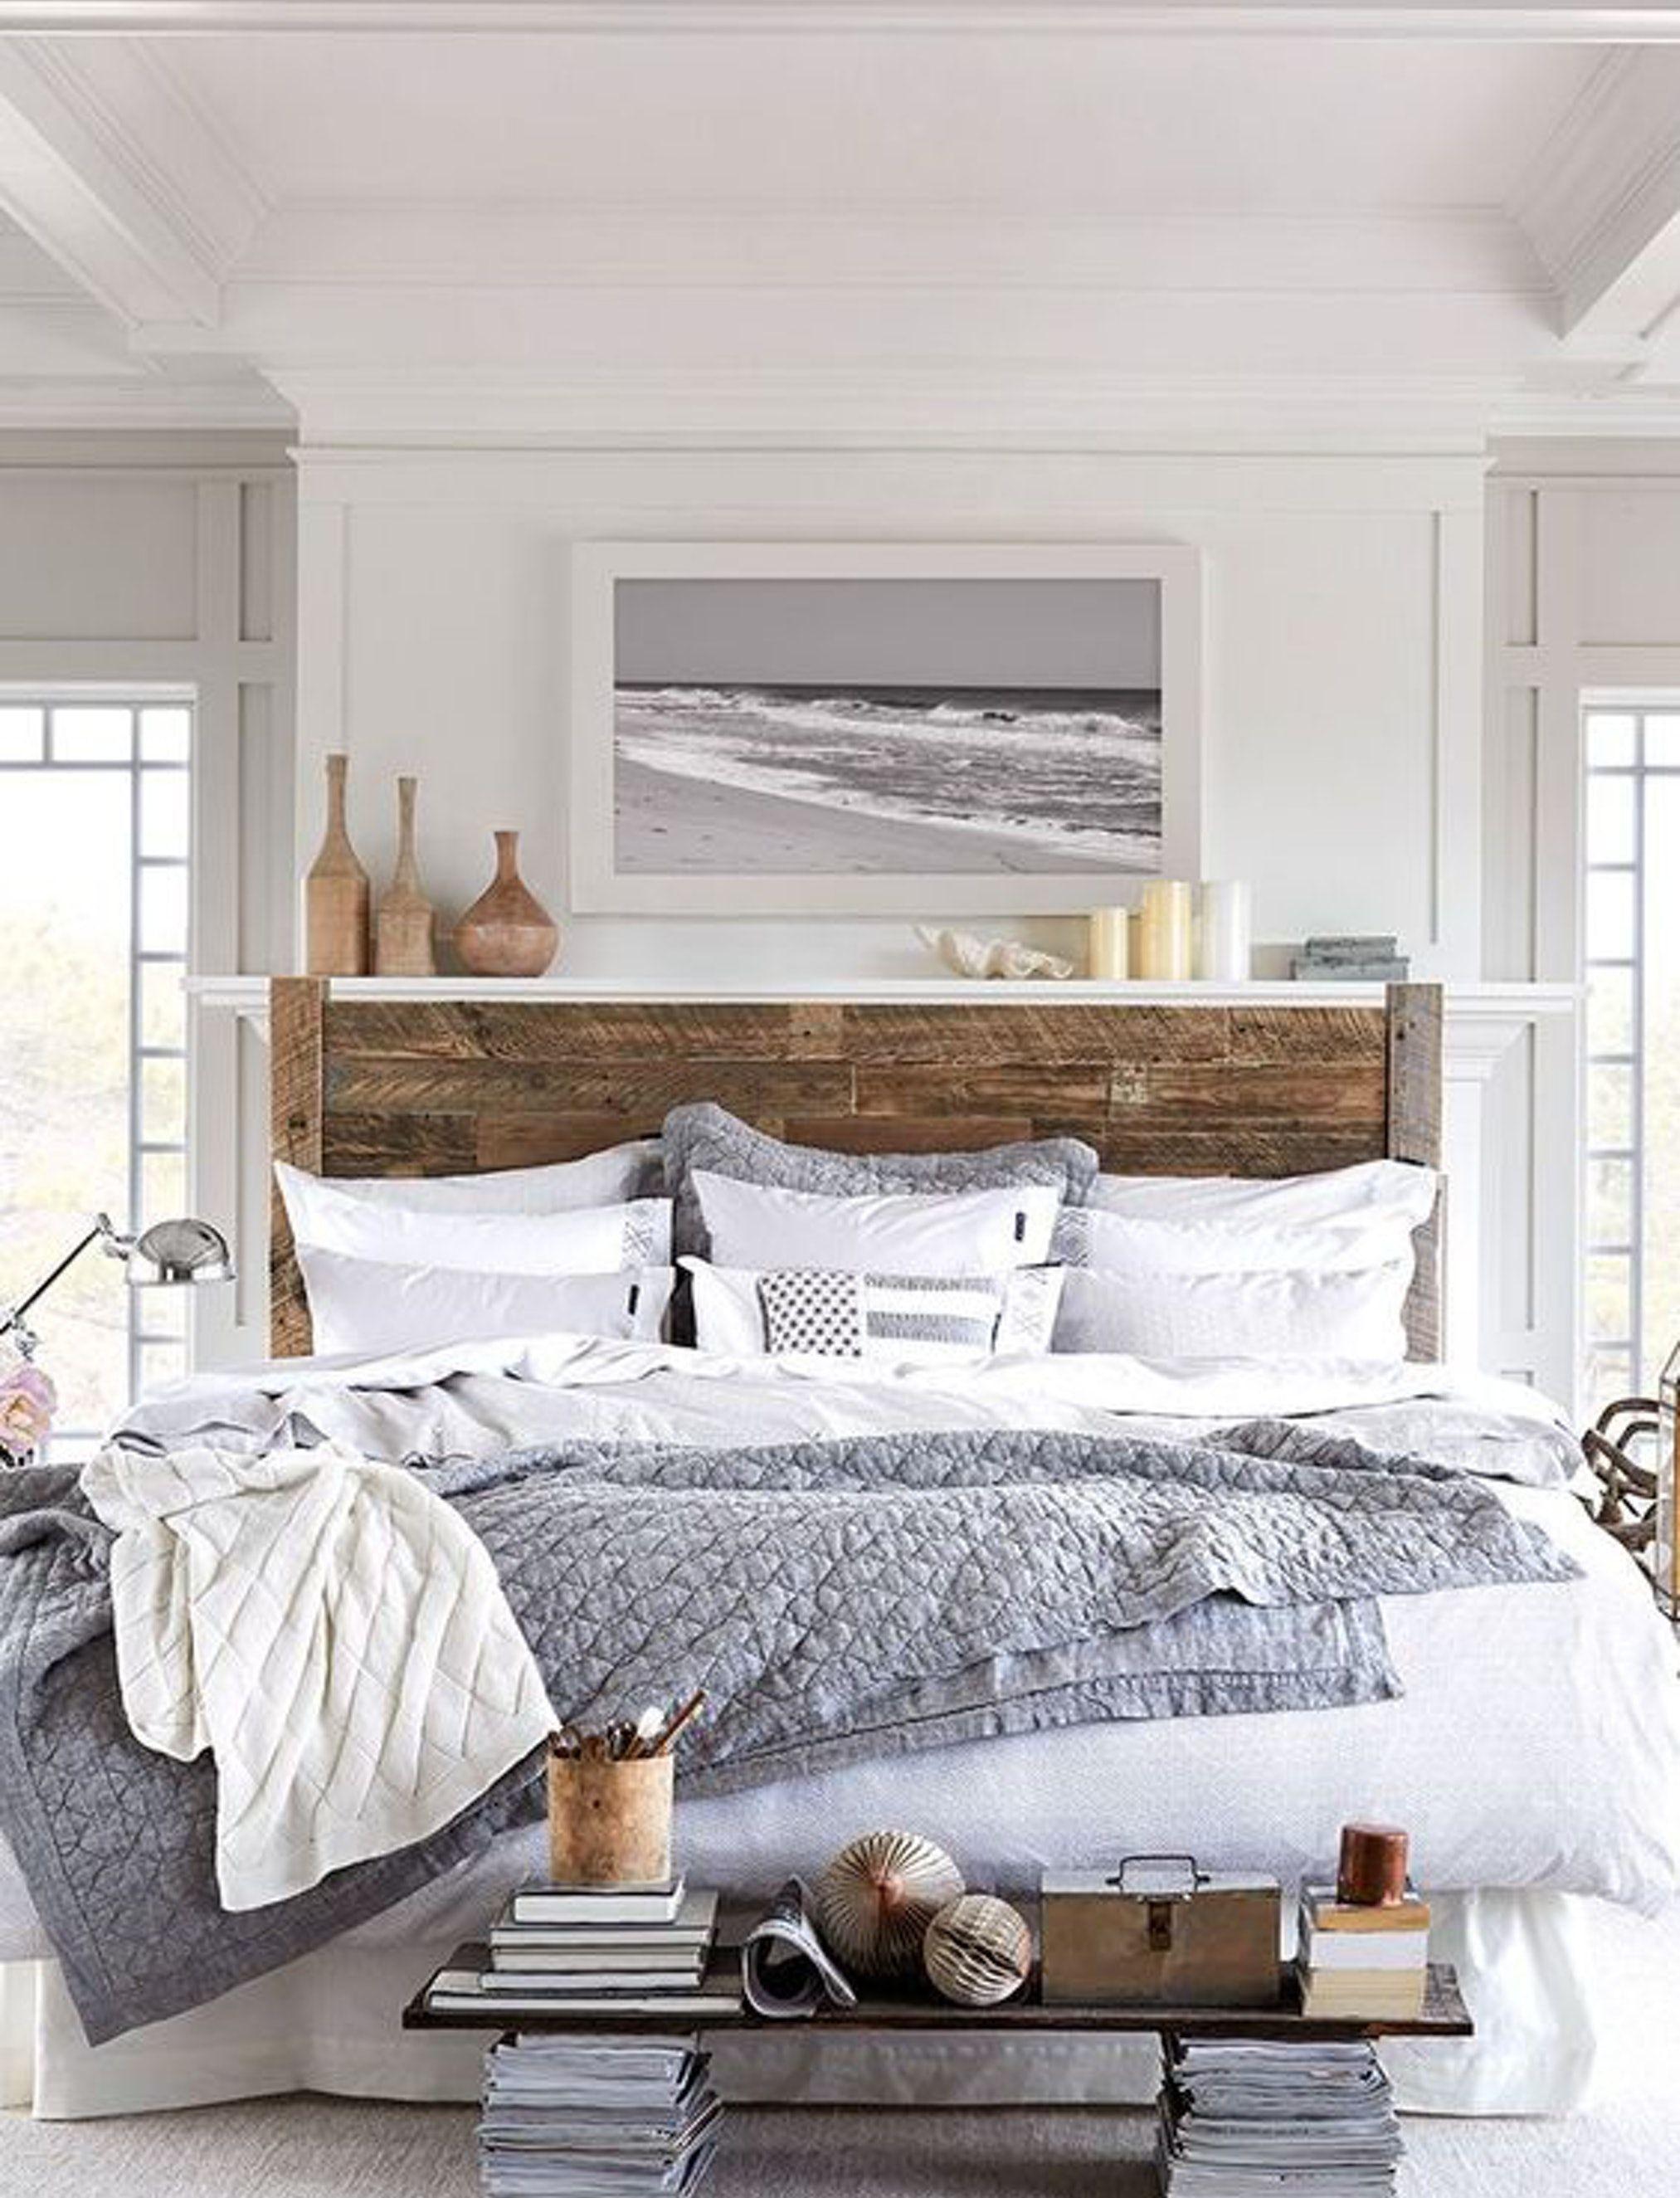 interior design style quiz what s your decorating style rh pinterest com bedroom decorating style quiz Small Bedroom Decorating Ideas